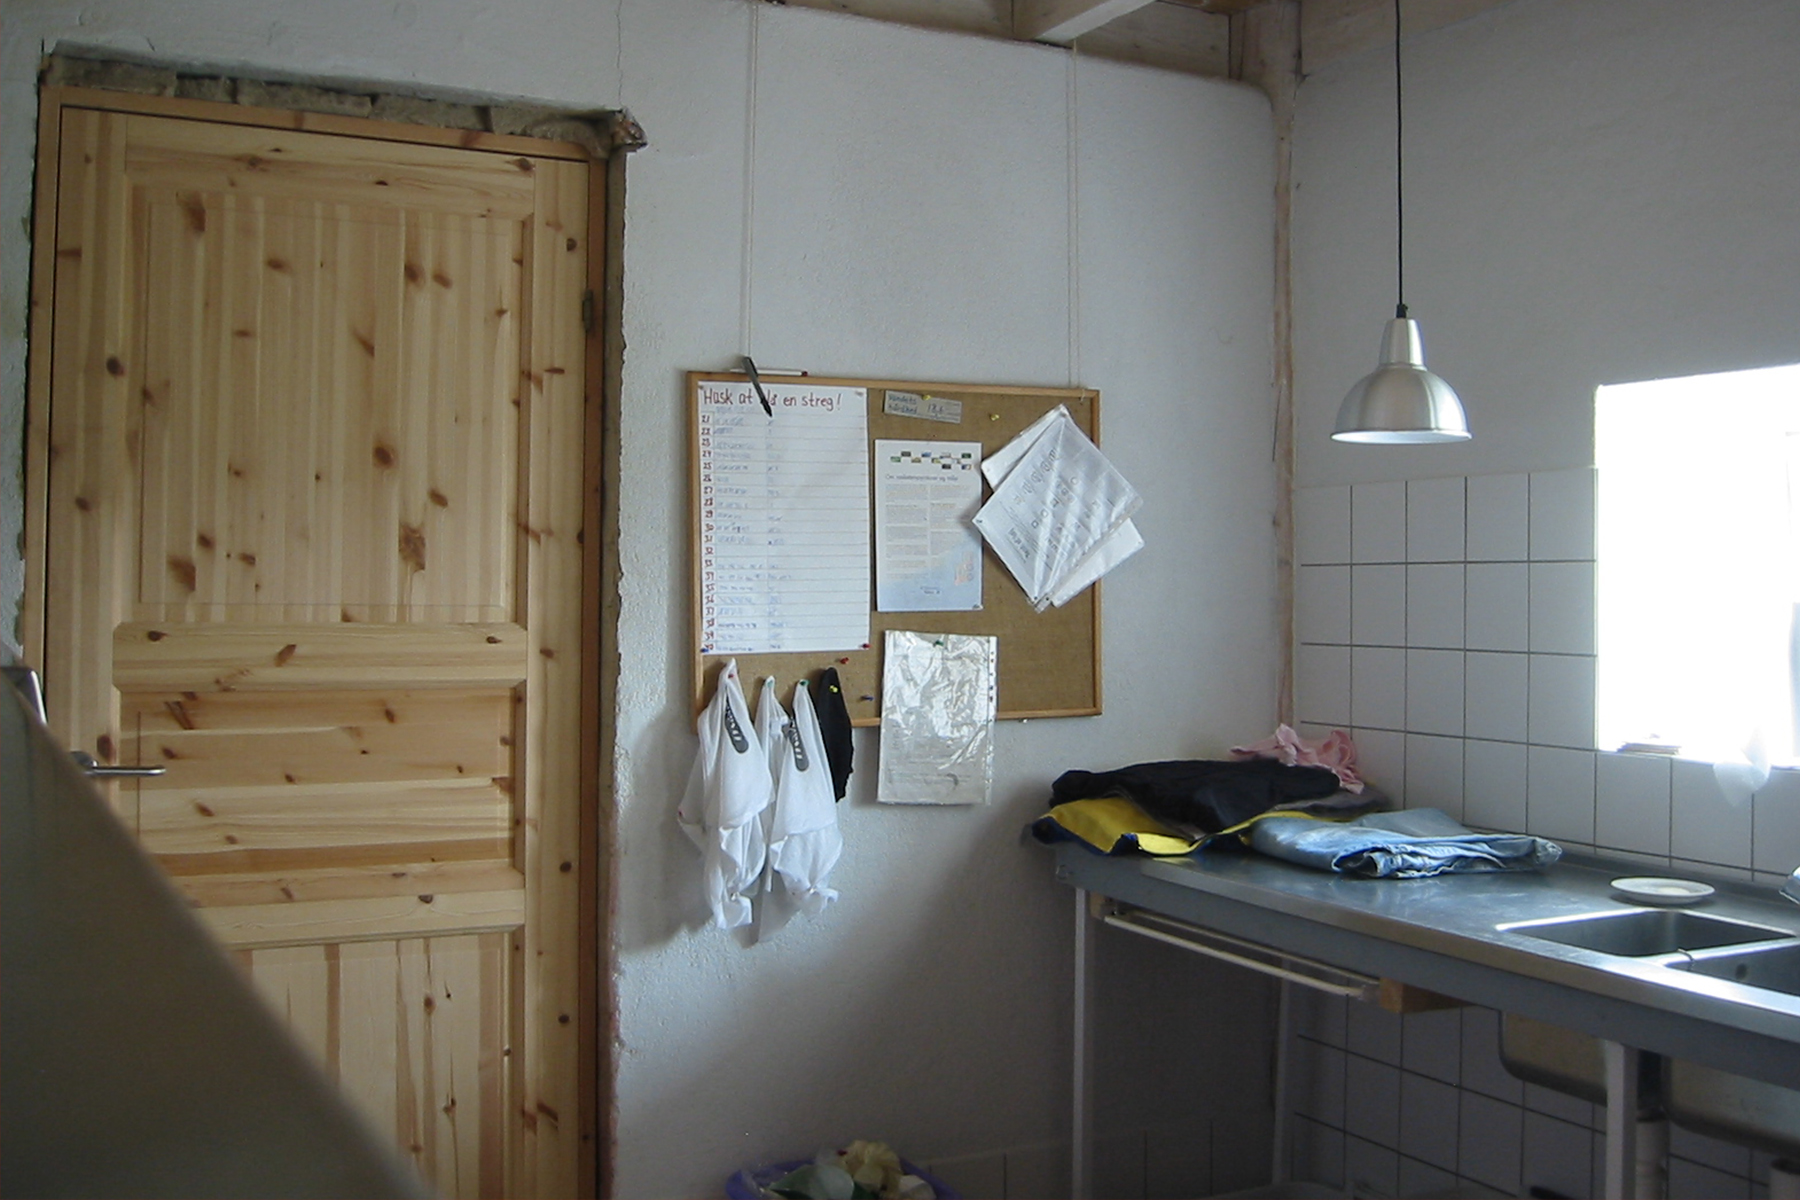 Munksoegaard Cohousing  in Roskilde, DK. Designed by Mangor Nagel